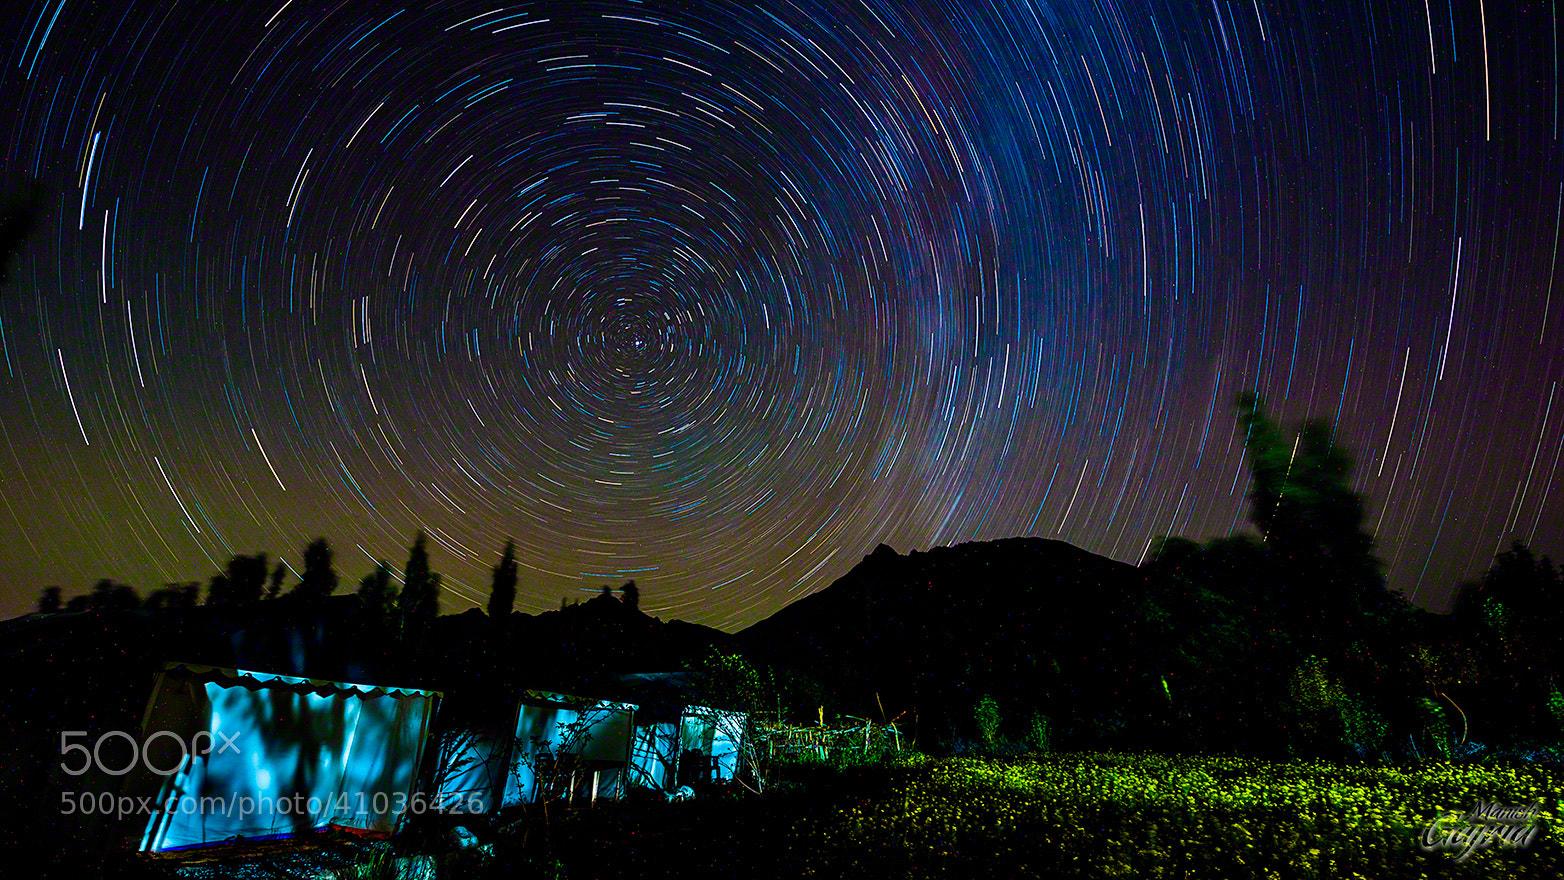 Photograph A Night at Nubra by Manish Gajria on 500px